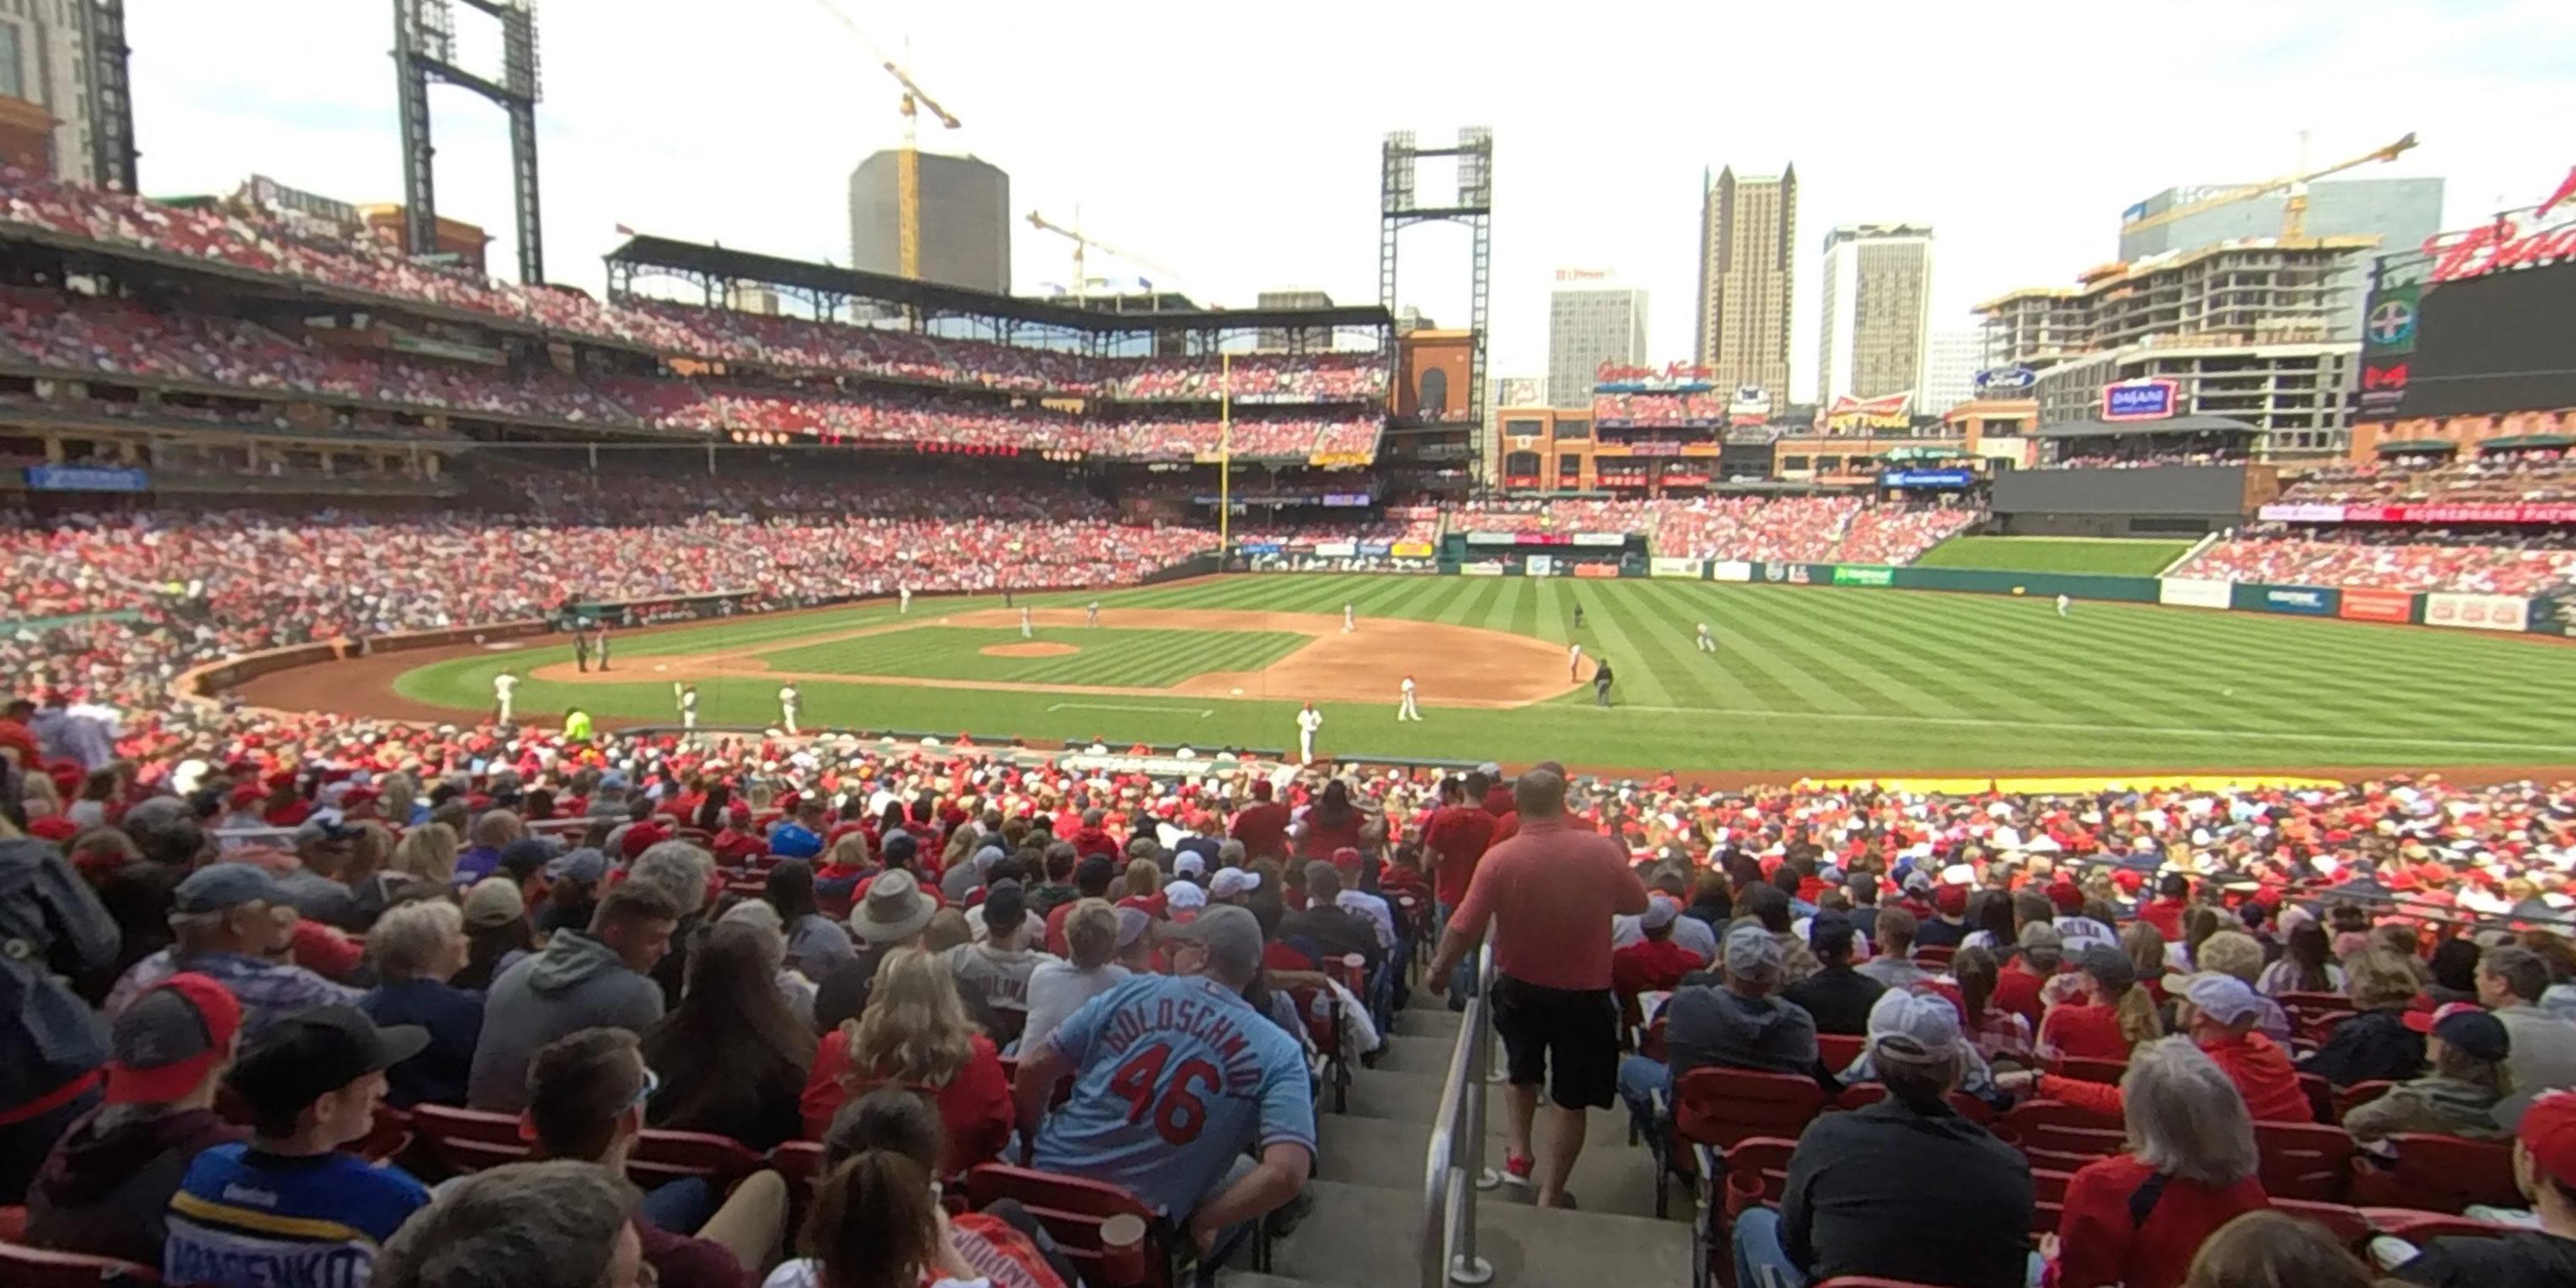 121c86b0 Busch Stadium Section 142 - RateYourSeats.com